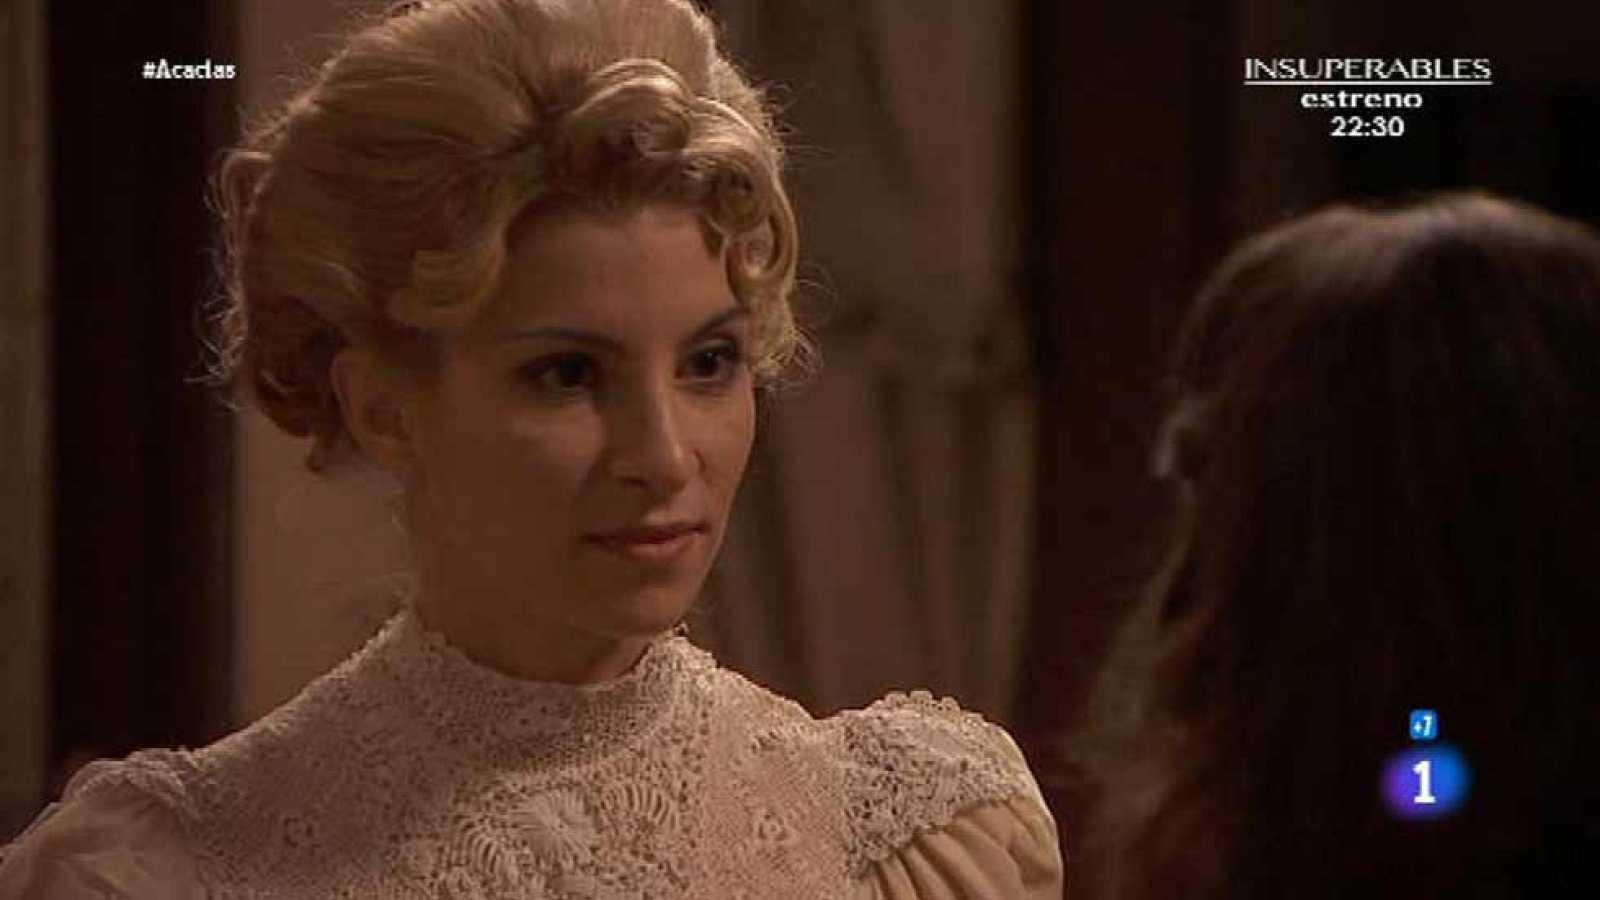 """Acacias 38""- Rita descubre que Cayetana está envenenando a su hija"